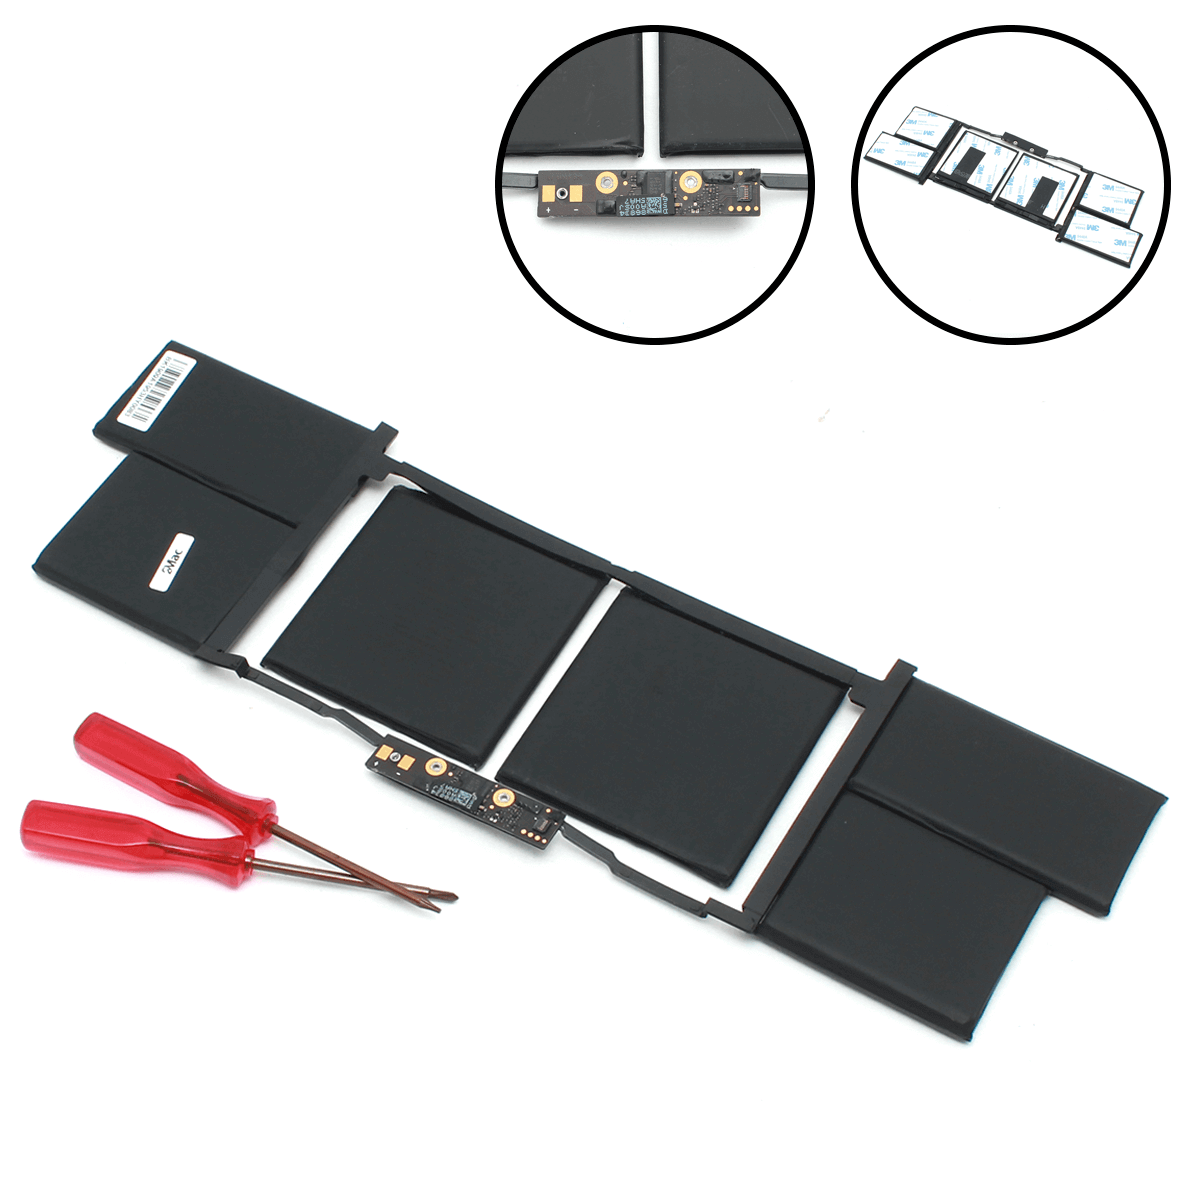 батарея для macbook pro 15 2018 a1953, батарея для a1990